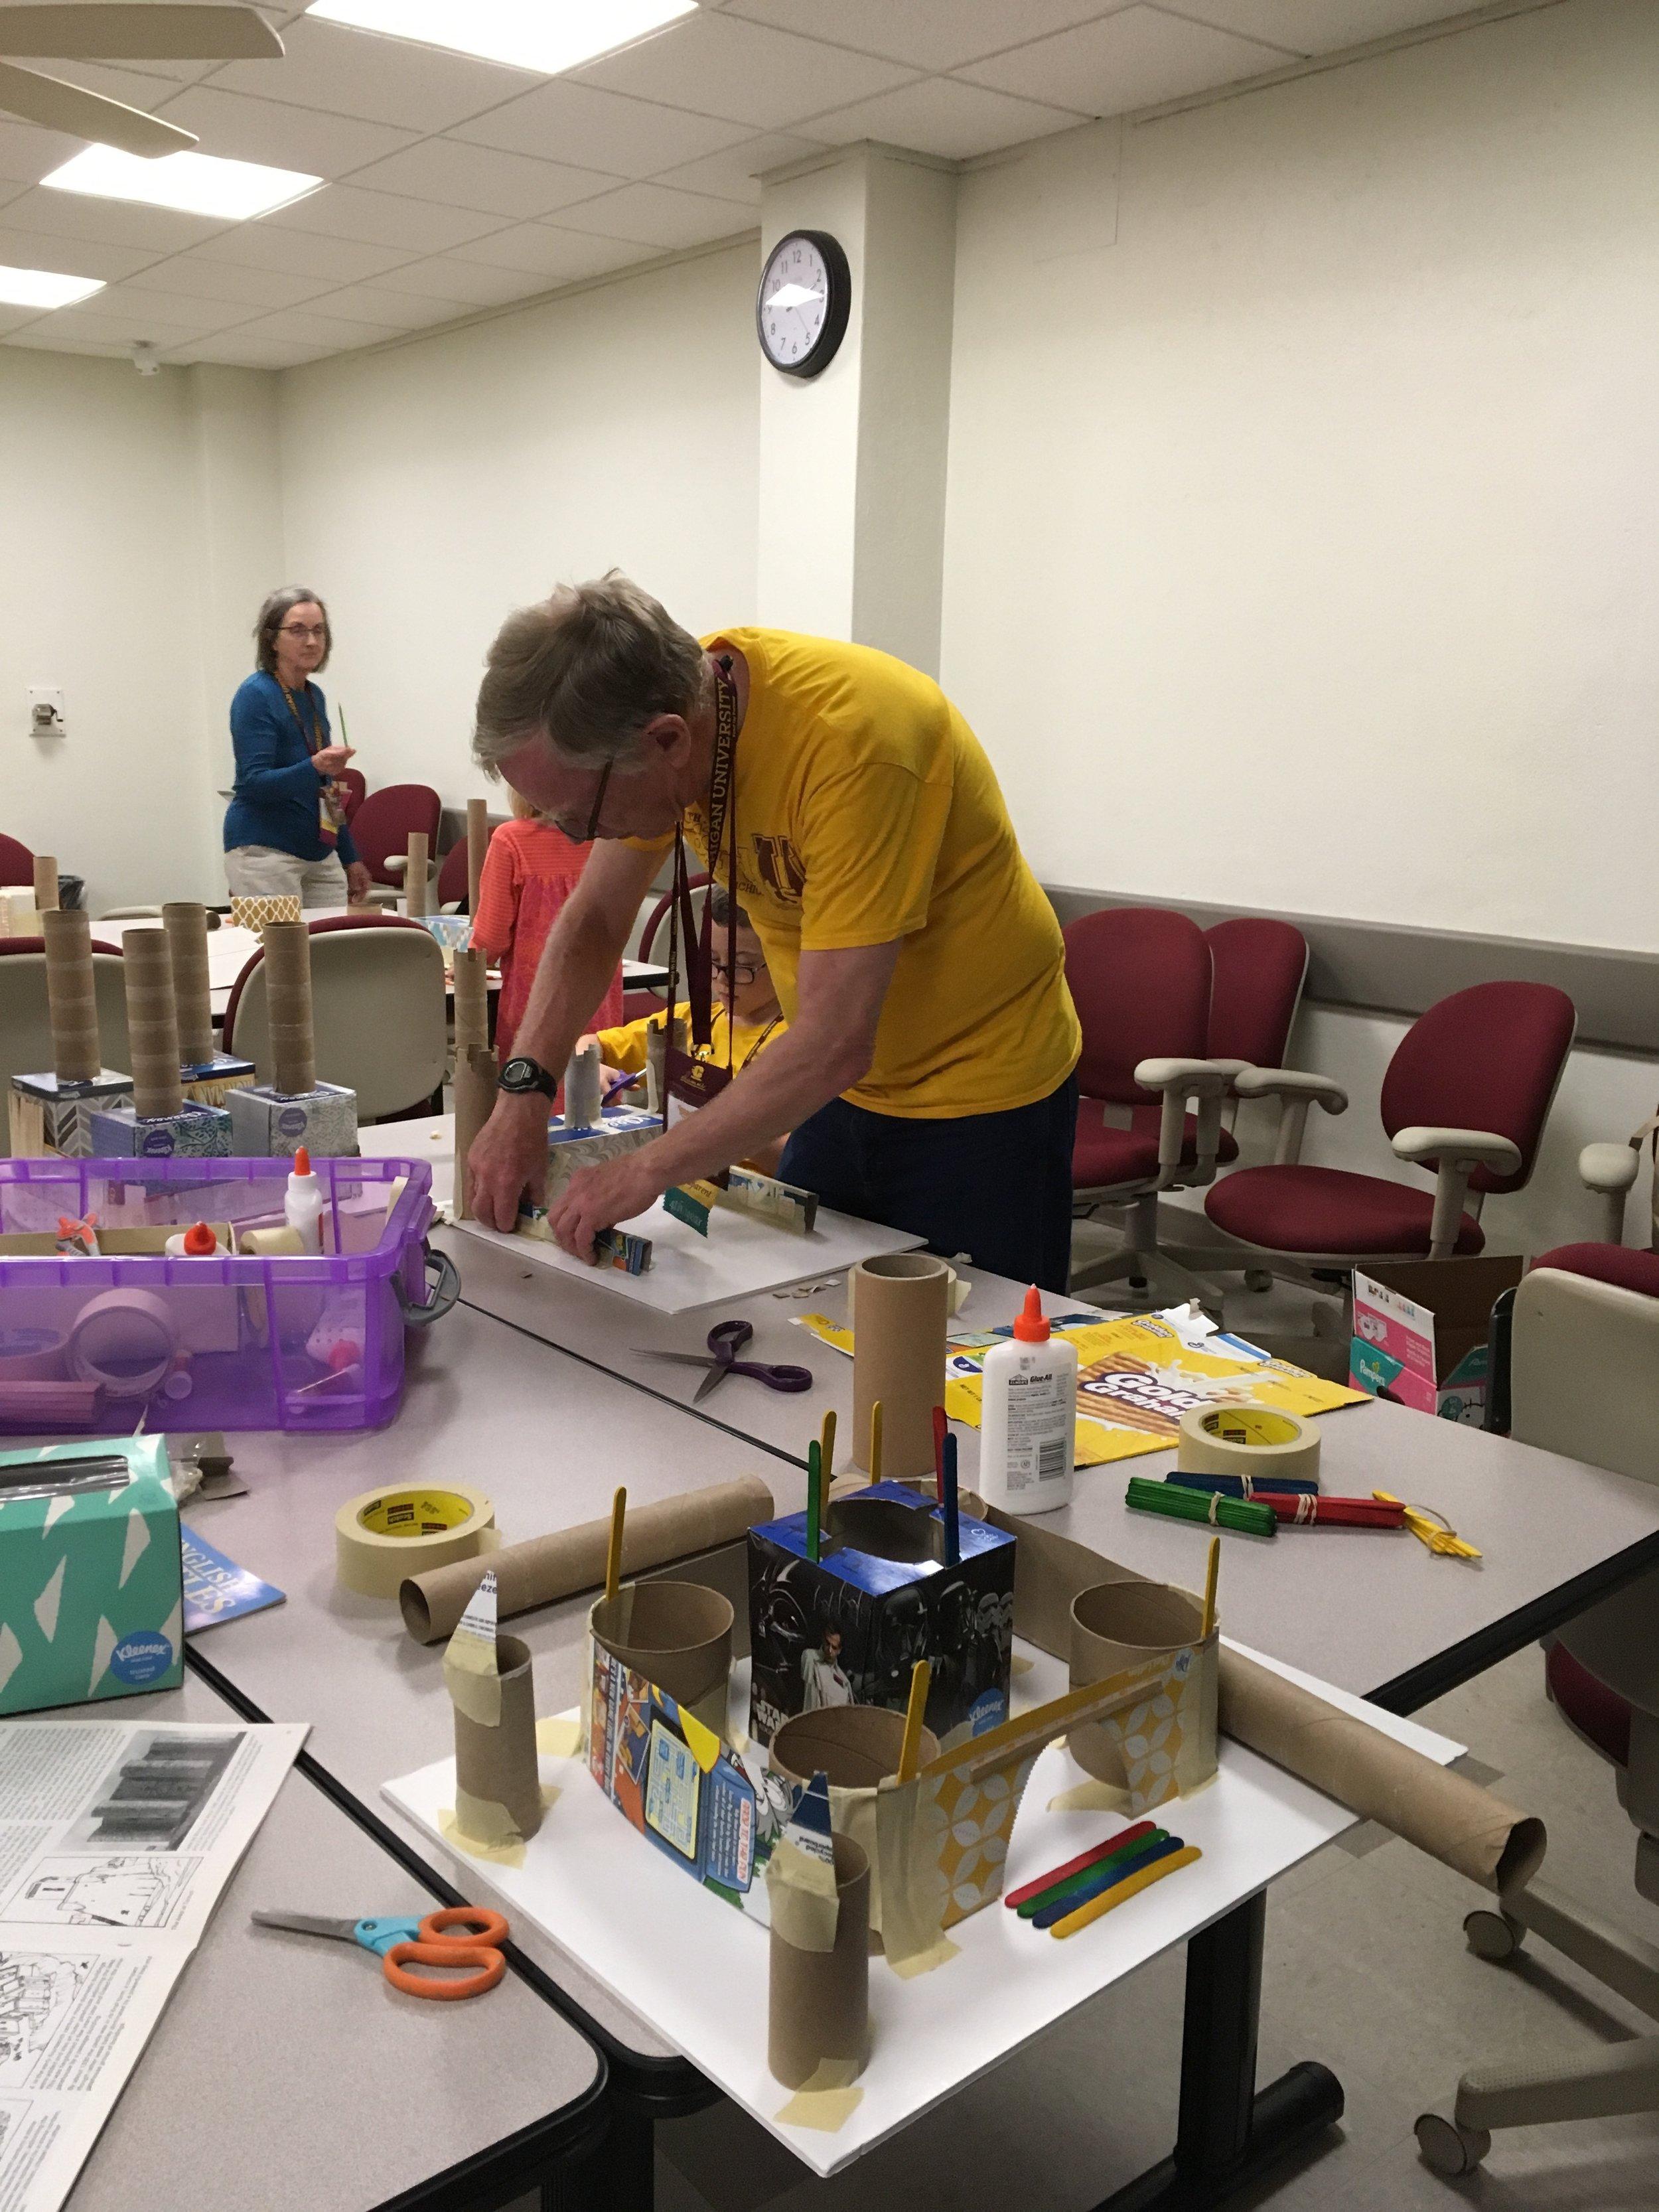 Building Cardboard Castles